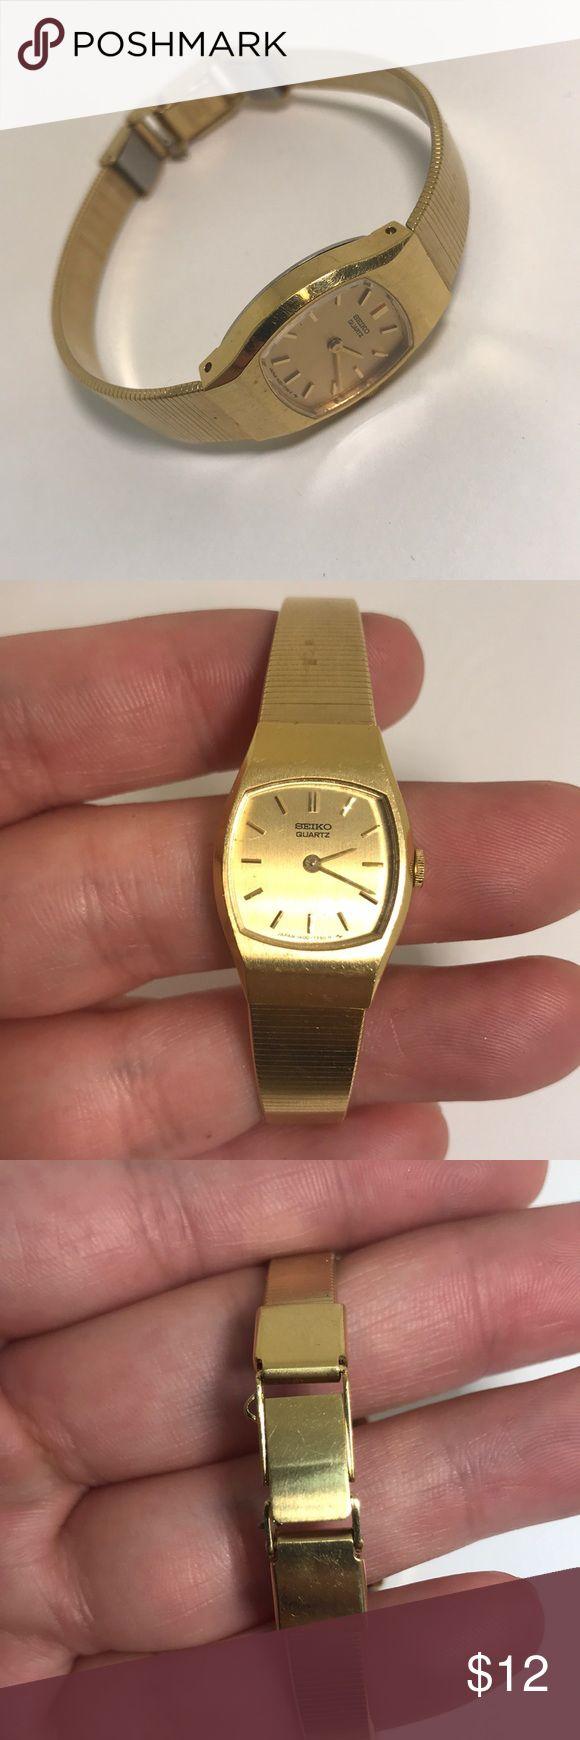 Seiko gold tone watch Seiko gold tone watch small Accessories Watches